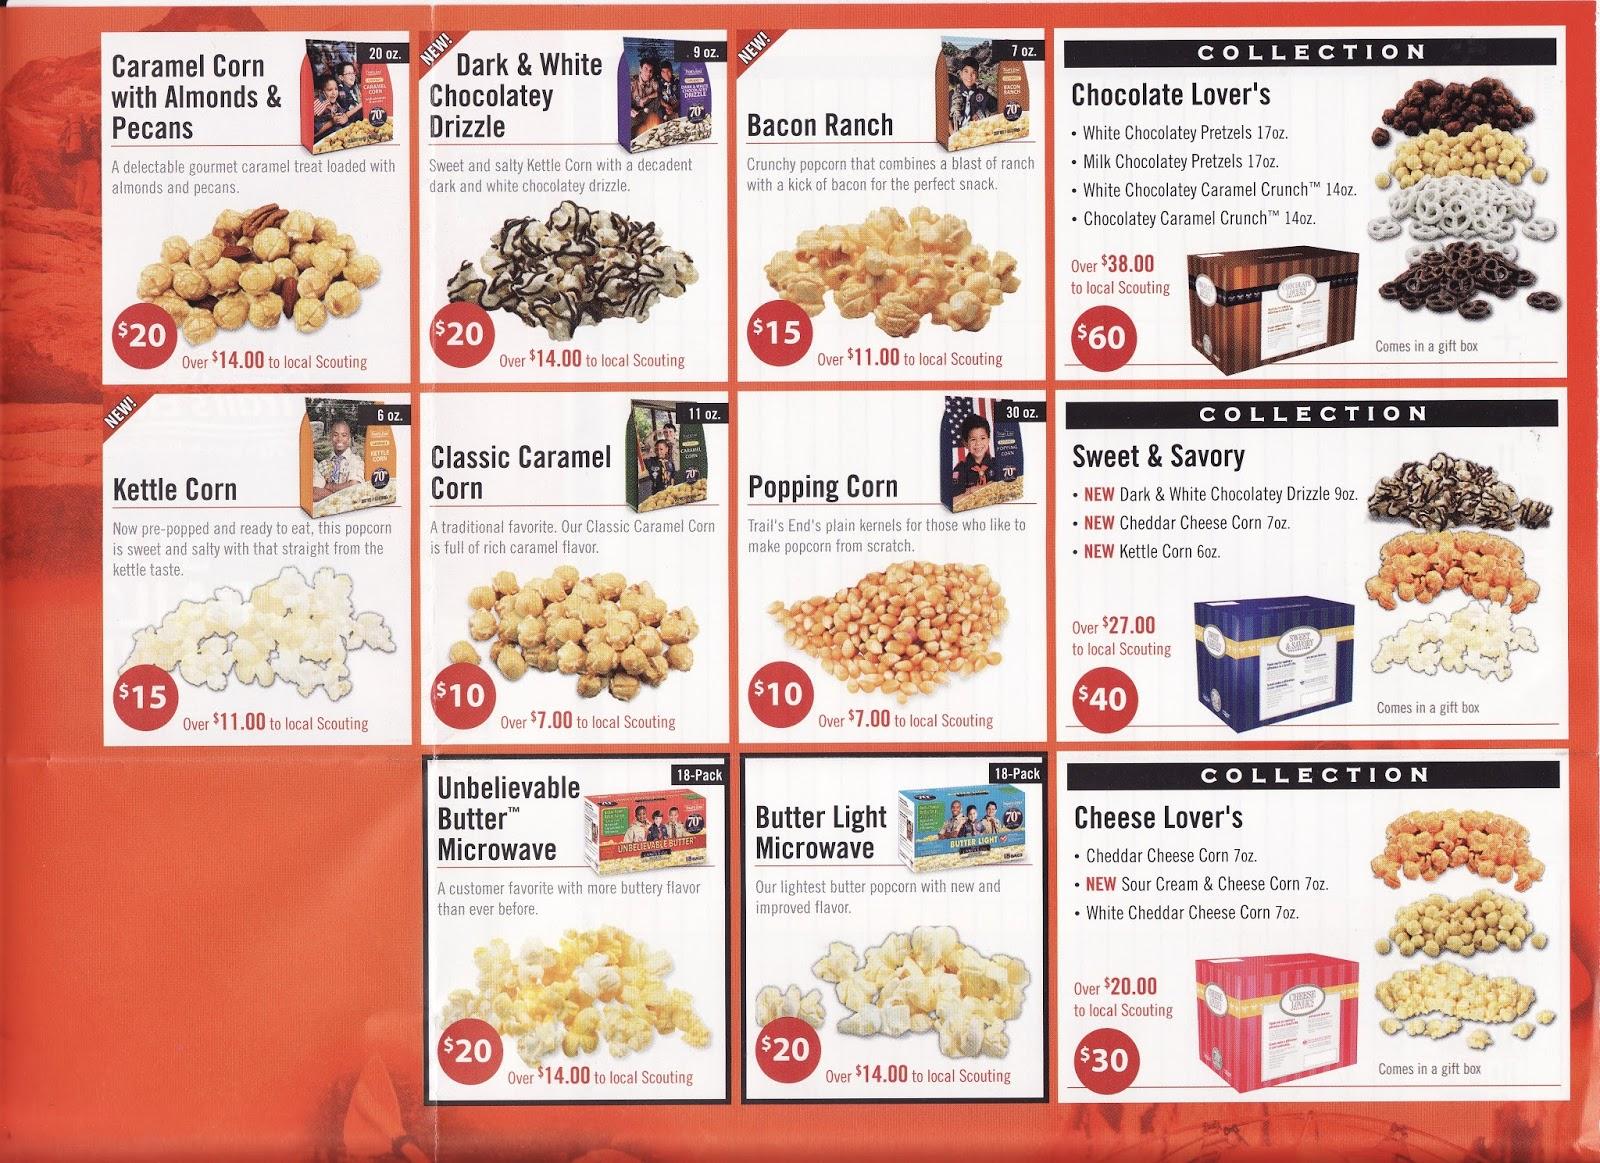 BSA Troop 1 Gaylord - Michigan: Popcorn Sales have begun!